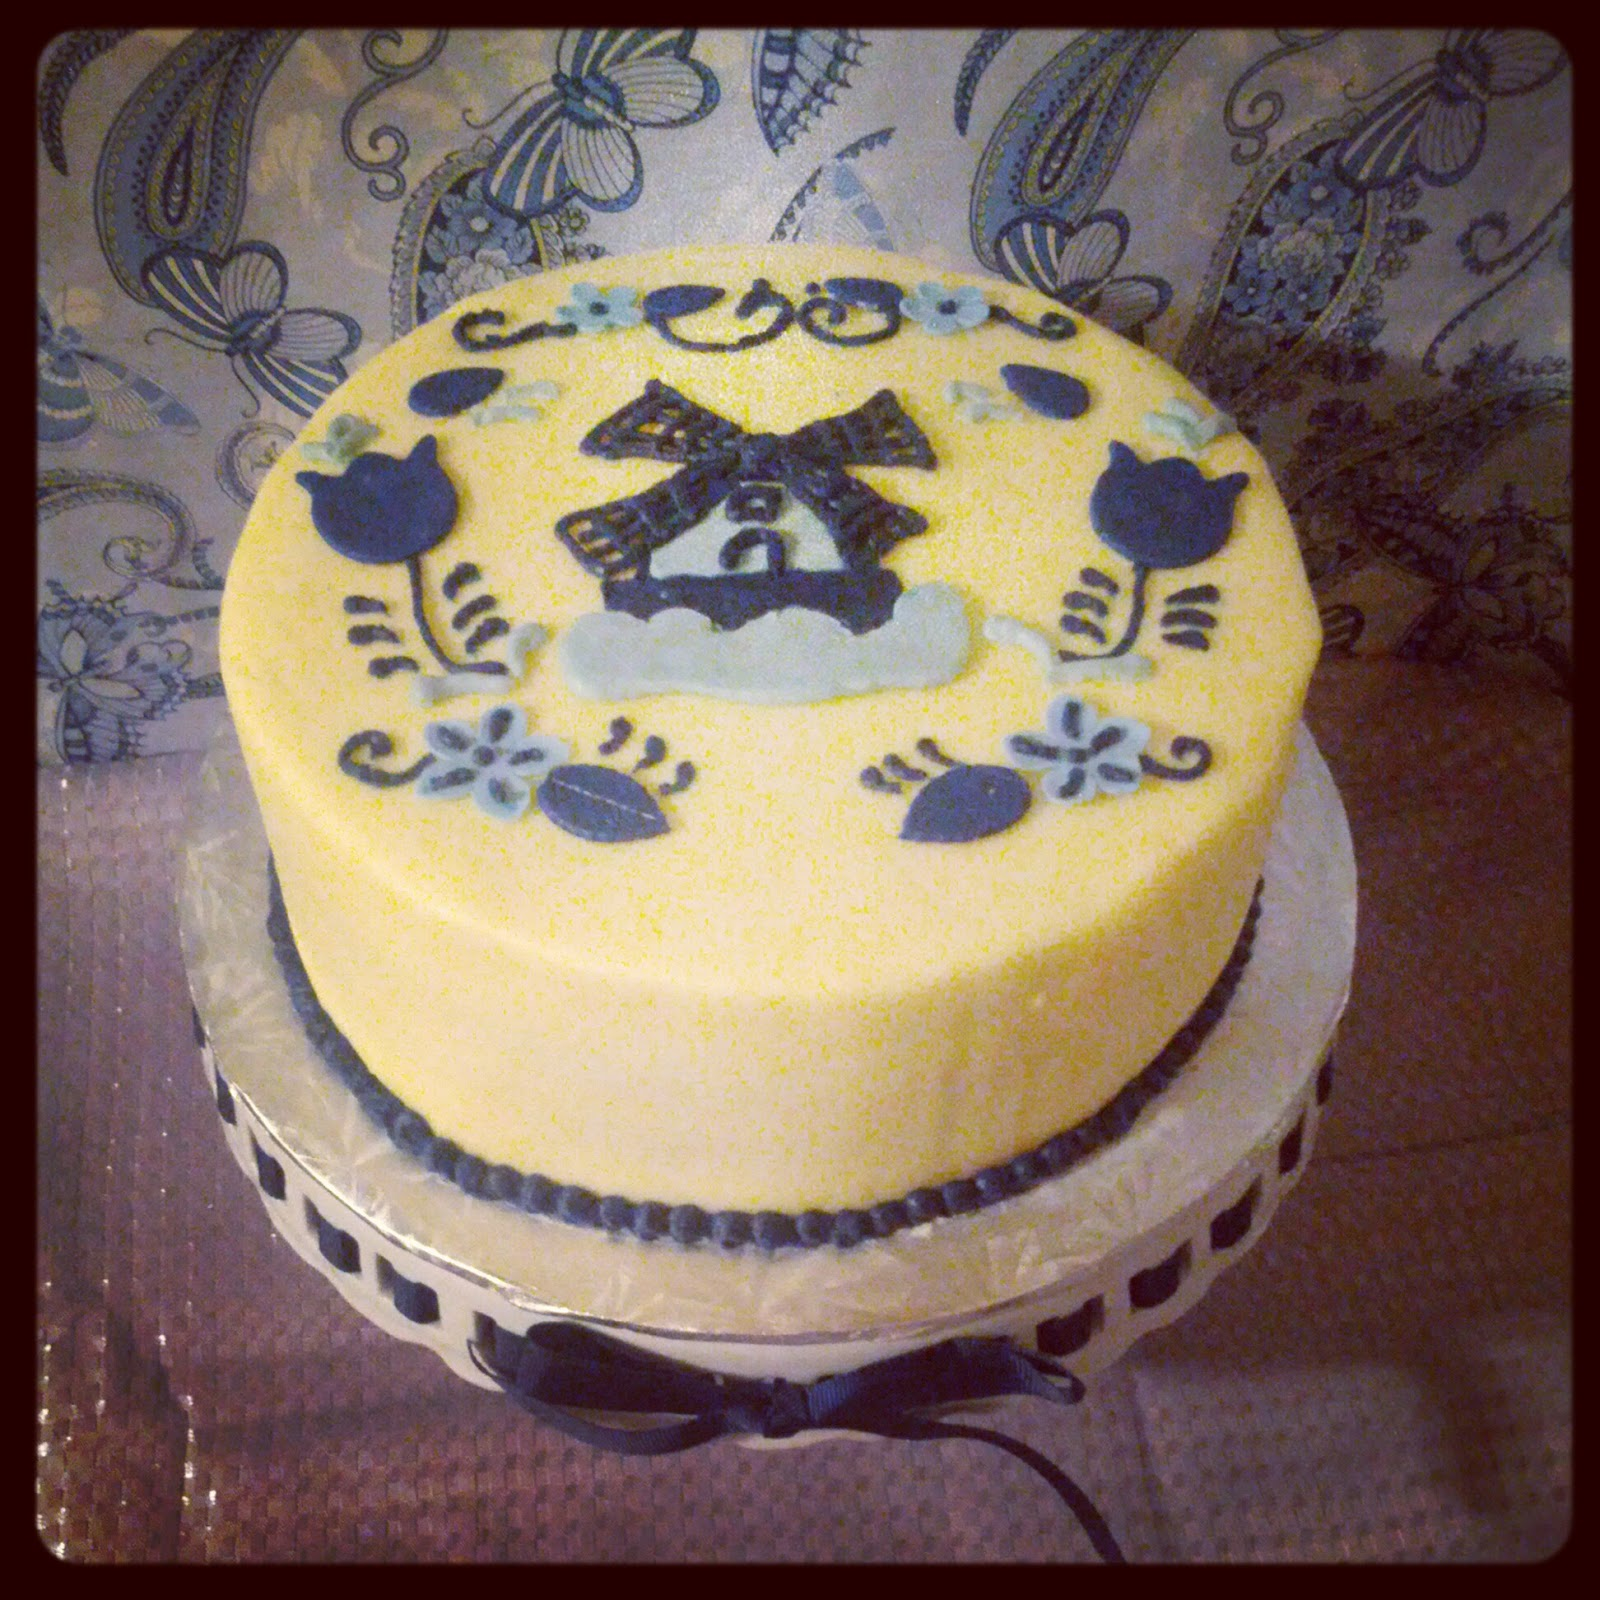 Second Generation Cake Design Delft Blue Birthday Cake